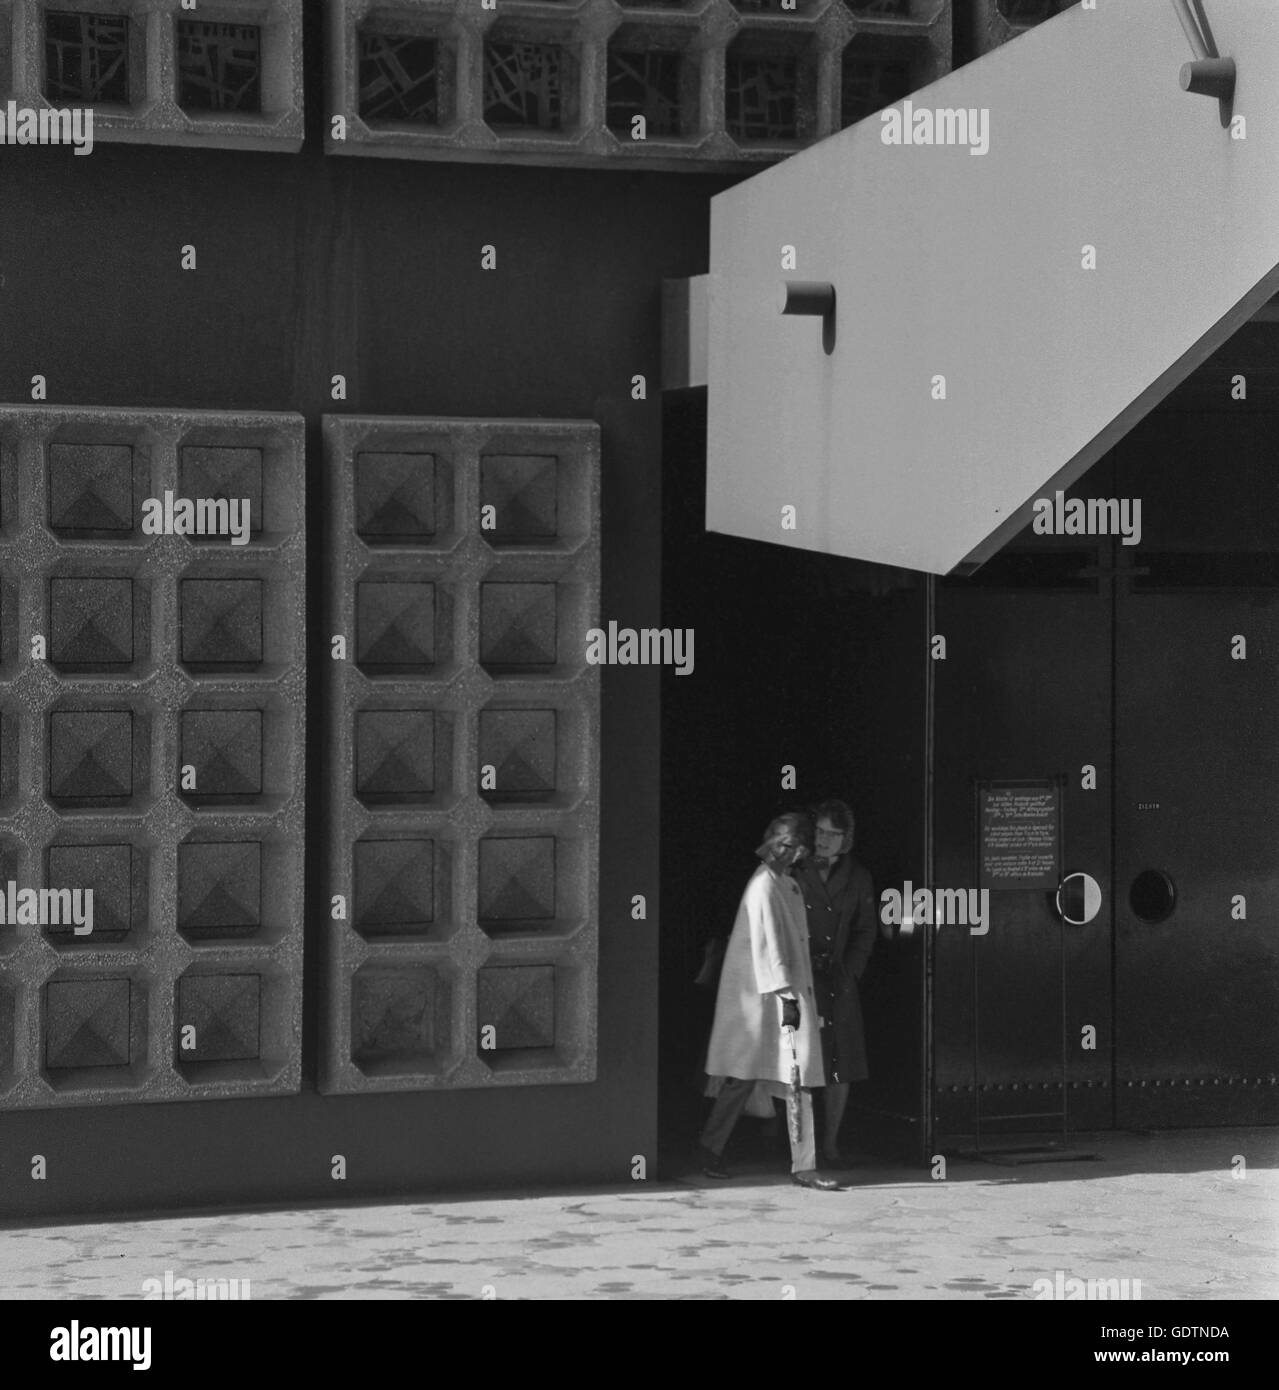 Entrance of the Kaiser Wilhelm Memorial Church in Berlin, 1964 Stock Photo